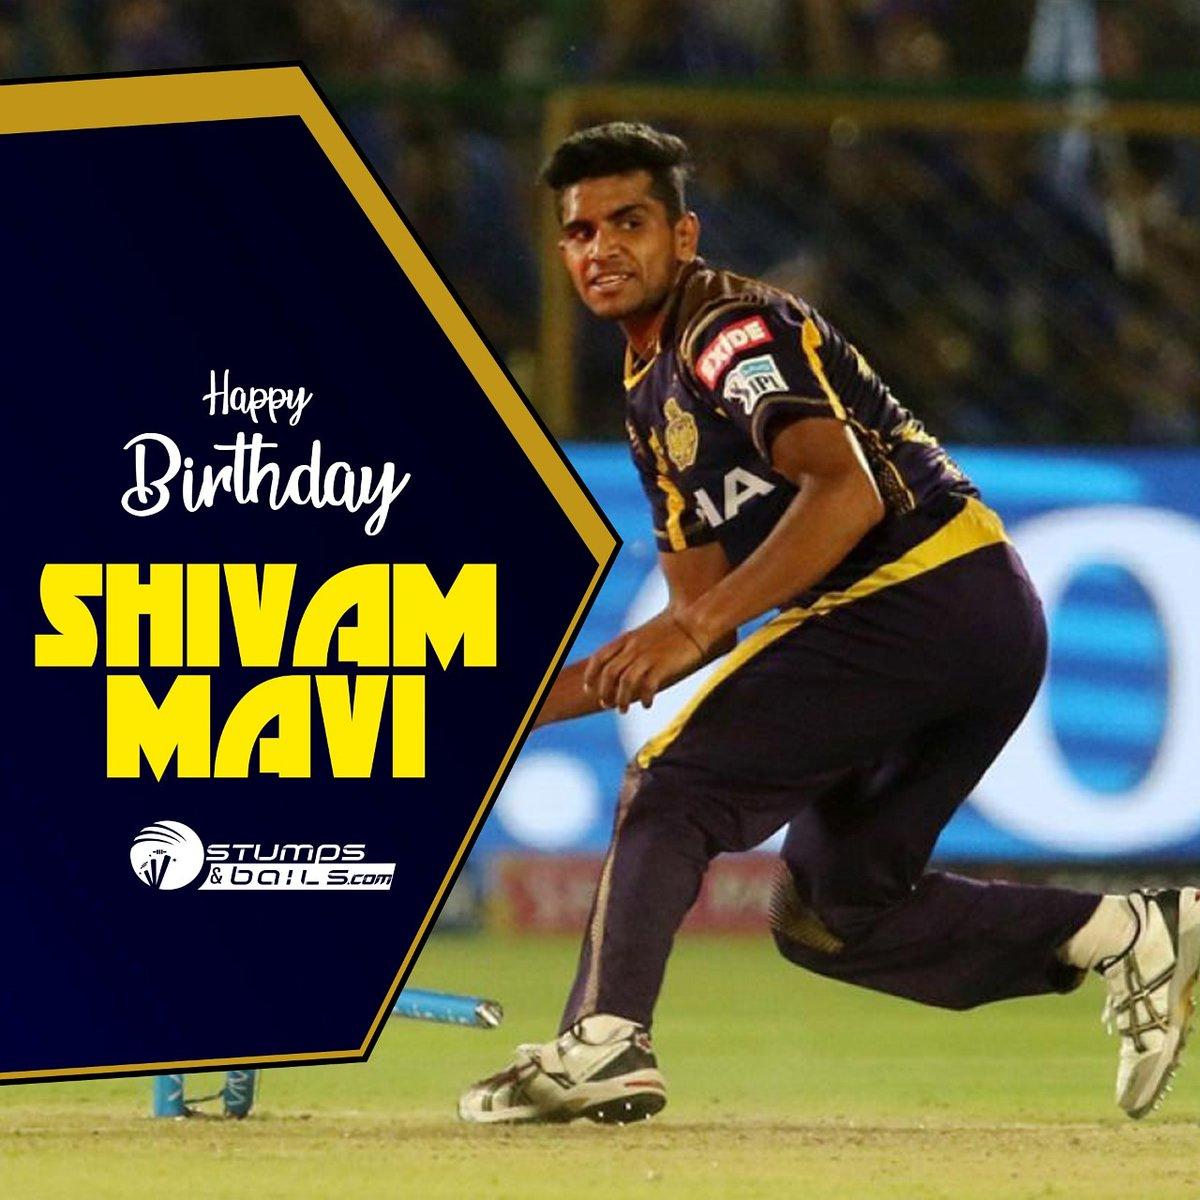 Happy Birthday @ShivamMavi23  Follow us @stumpnbails  #Indiancricketer #Cricketerbirthday #Cricketer #KKR #kolkataknightriders #HappybirthdayShivamMavi